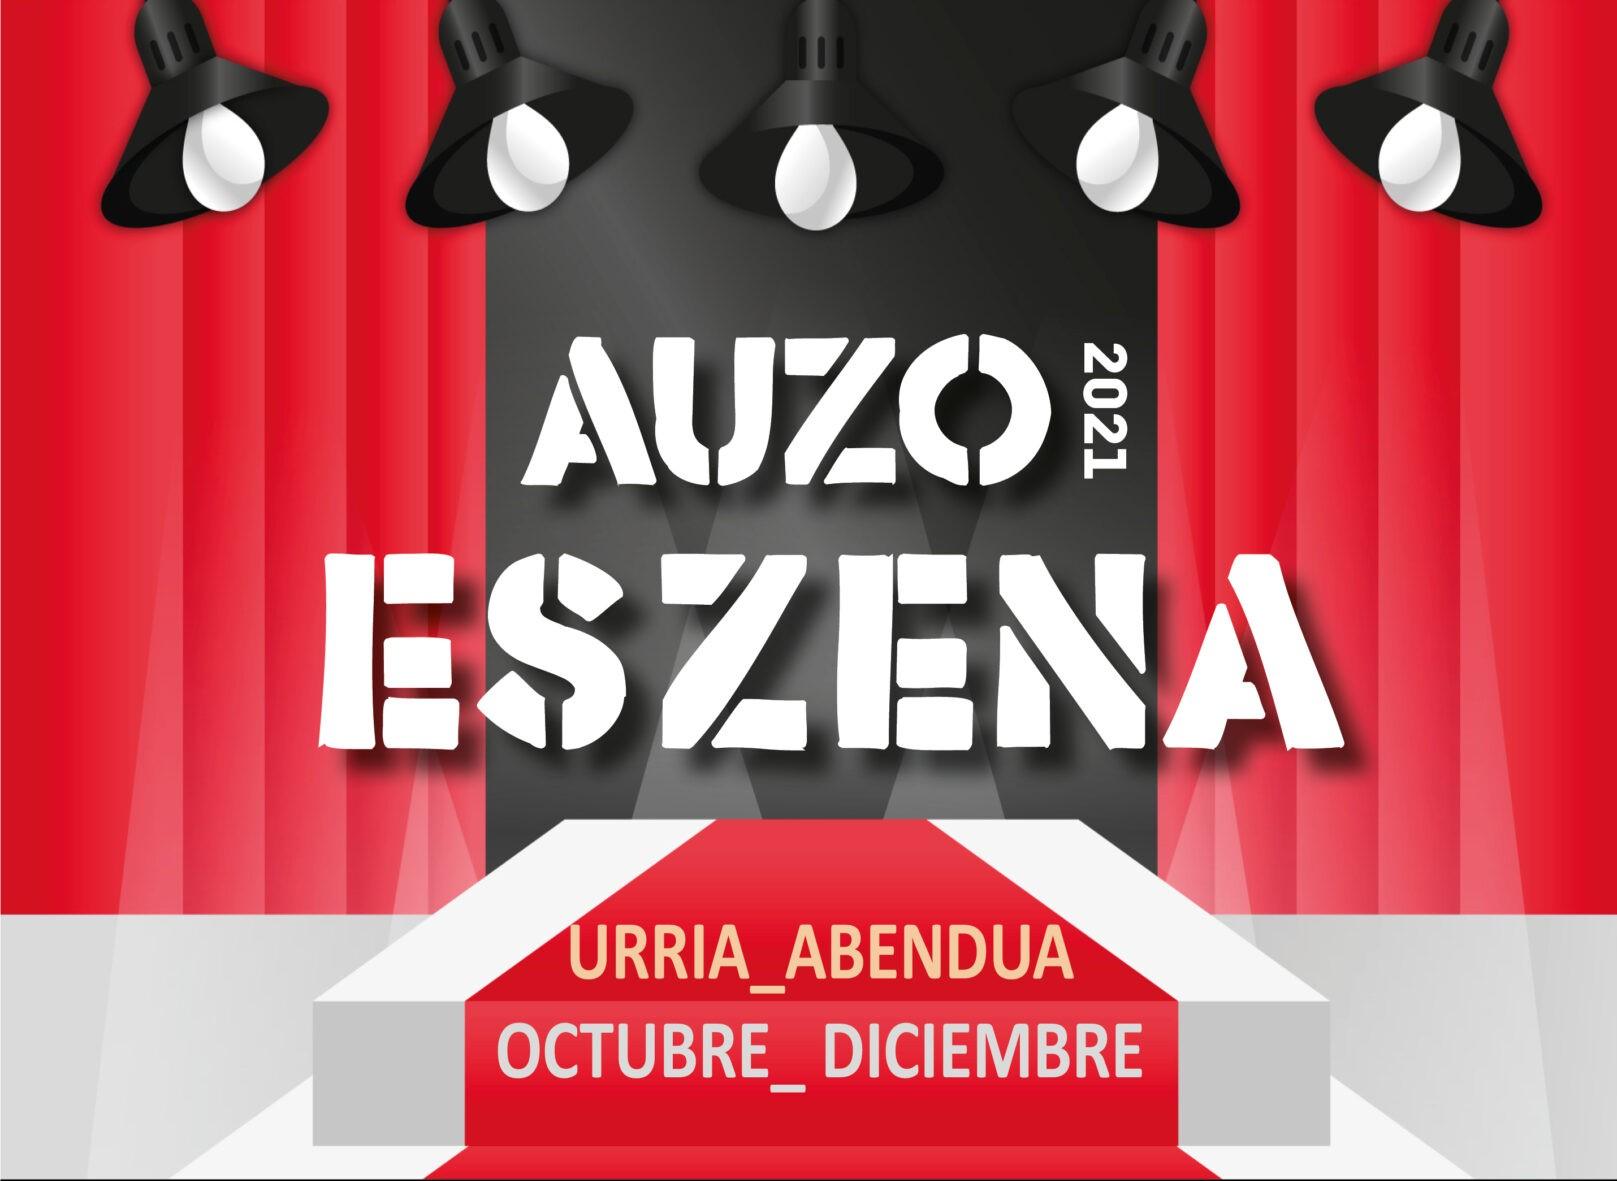 auzo-eszena-2021